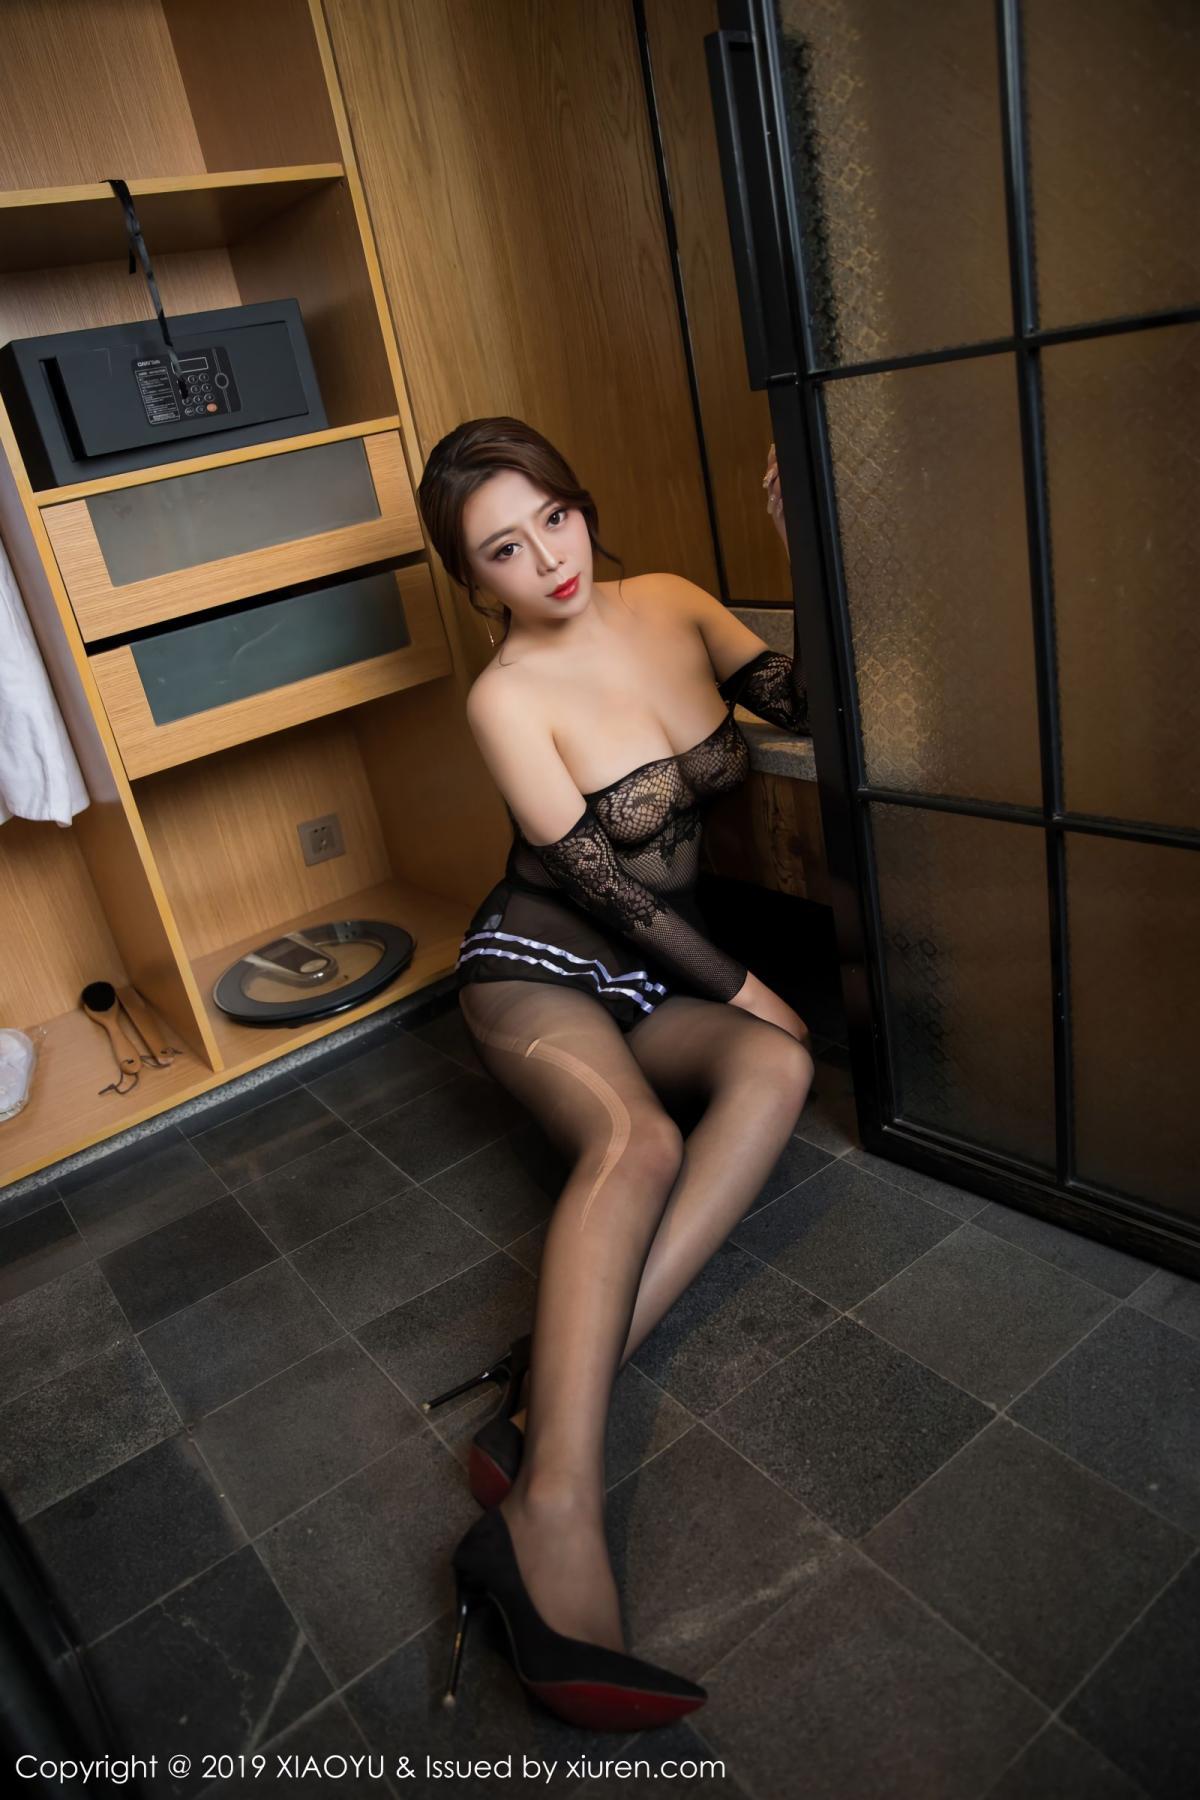 [XiaoYu] Vol.016 Miki Tu 27P, Miki Tu, Tall, XiaoYu